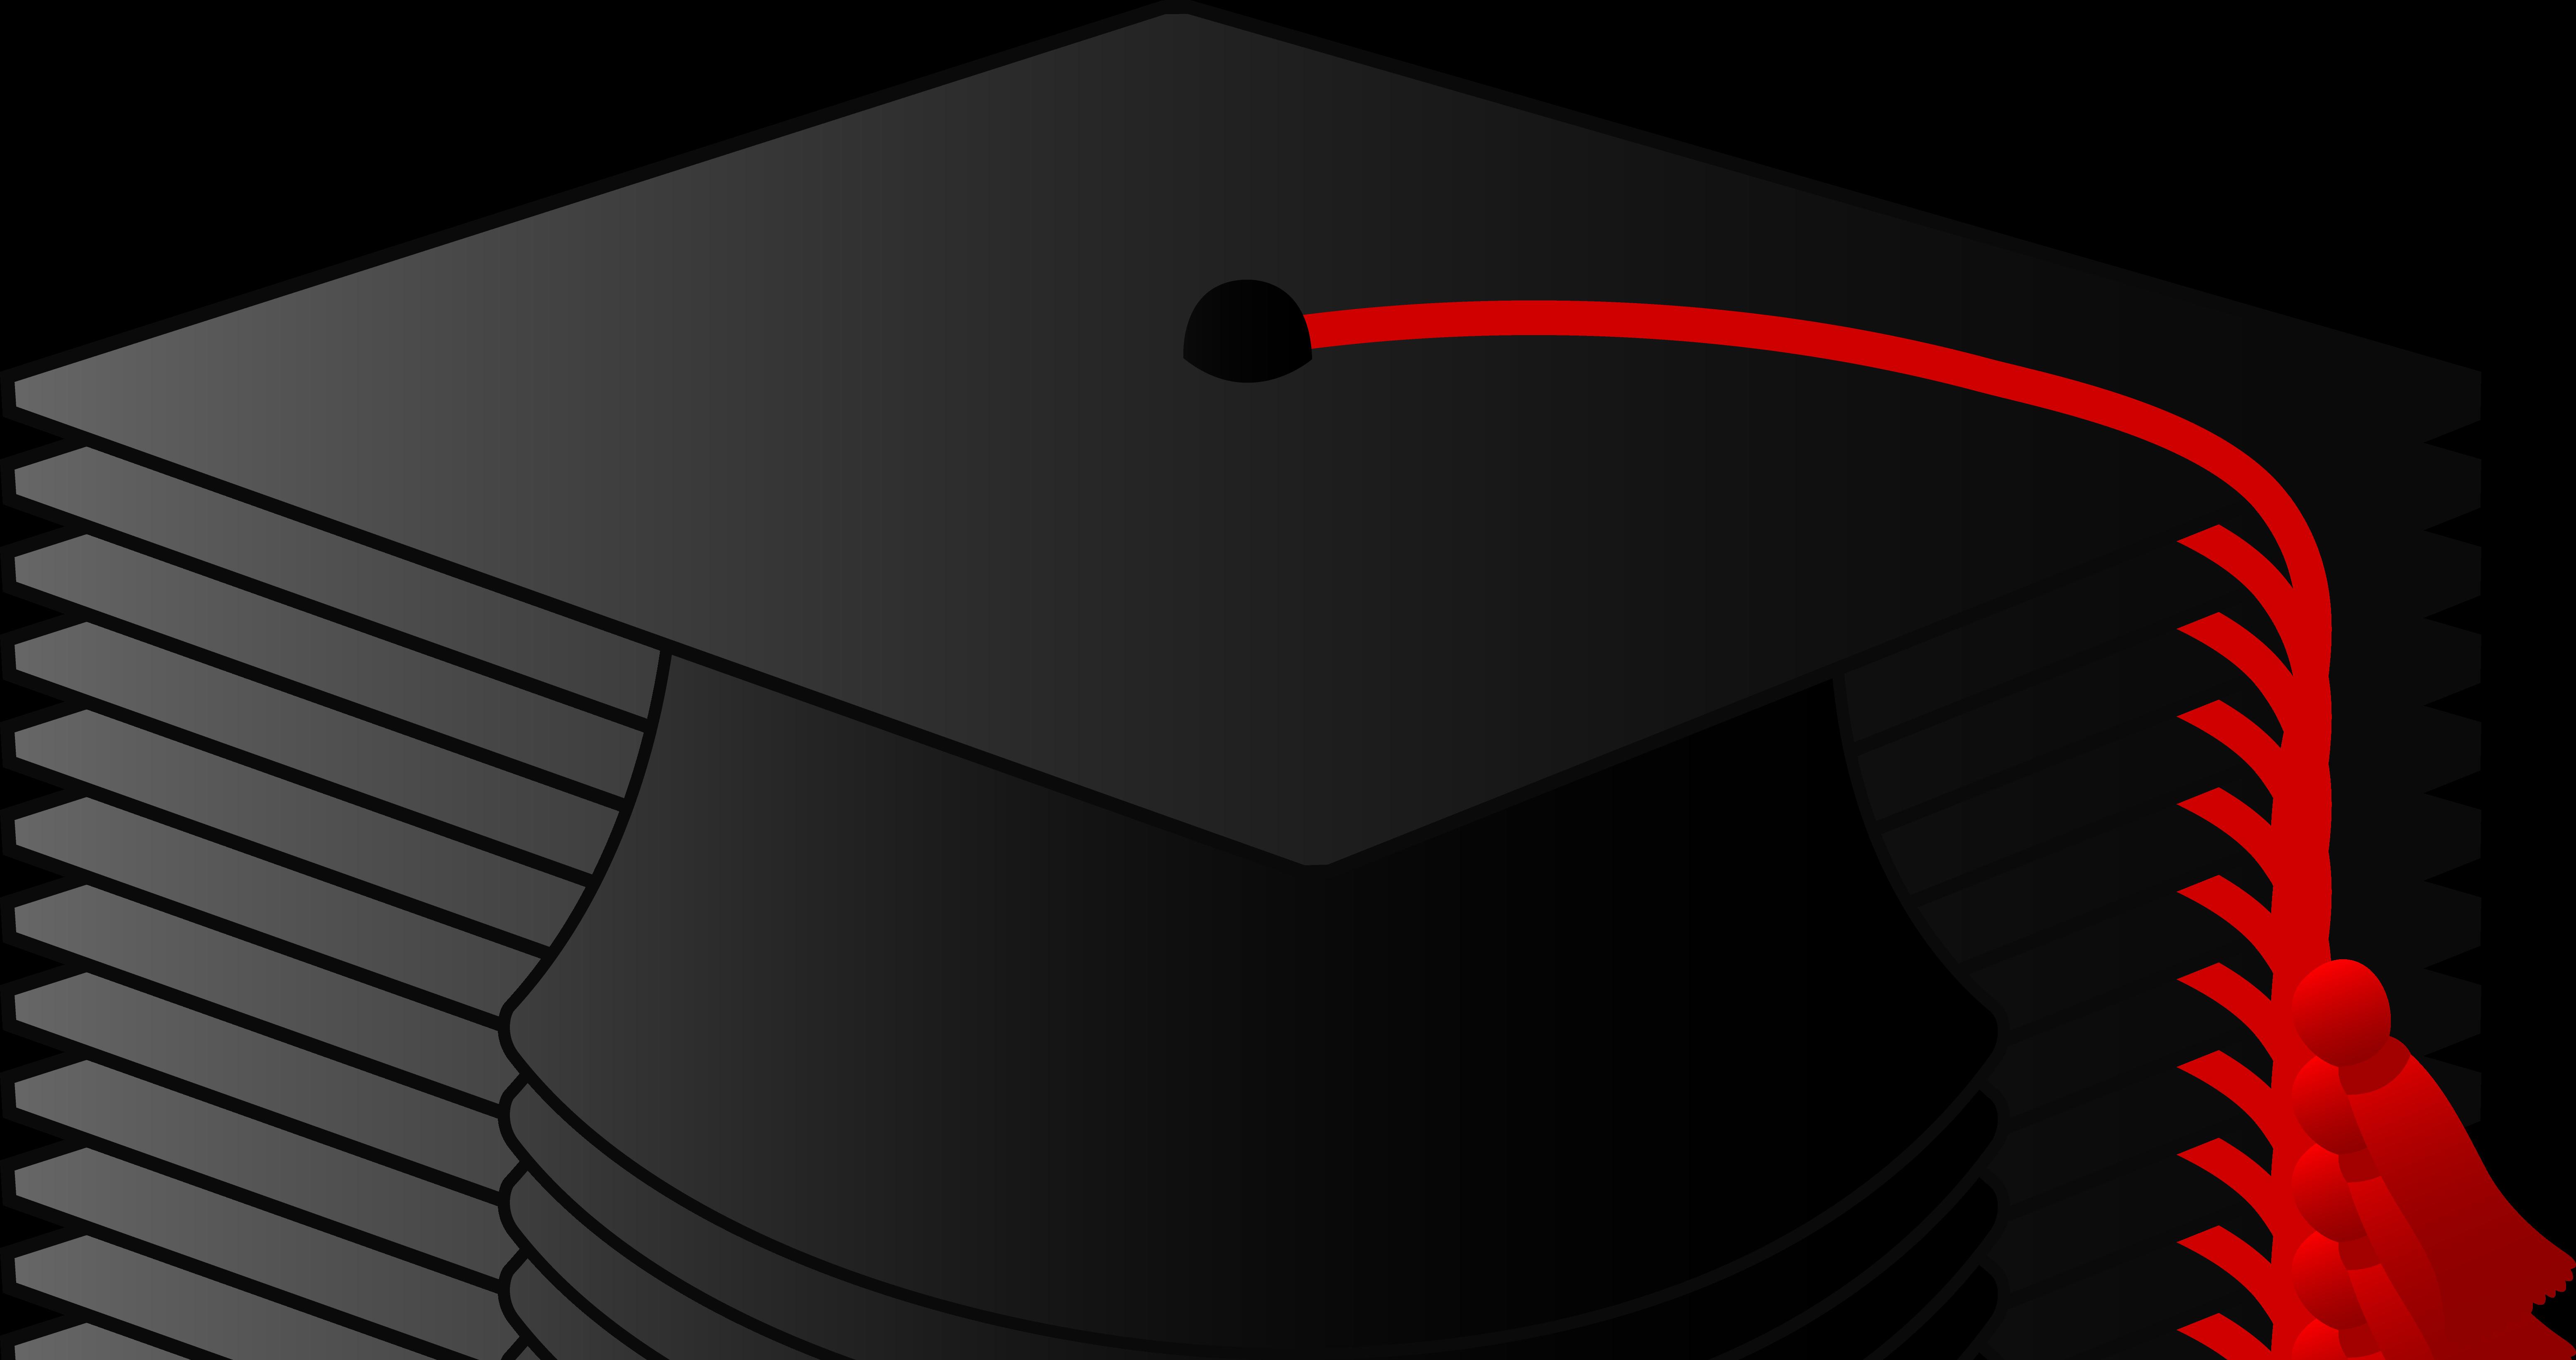 6204x3275 Graduation Hat Graduation Cap Clipart No Background Free